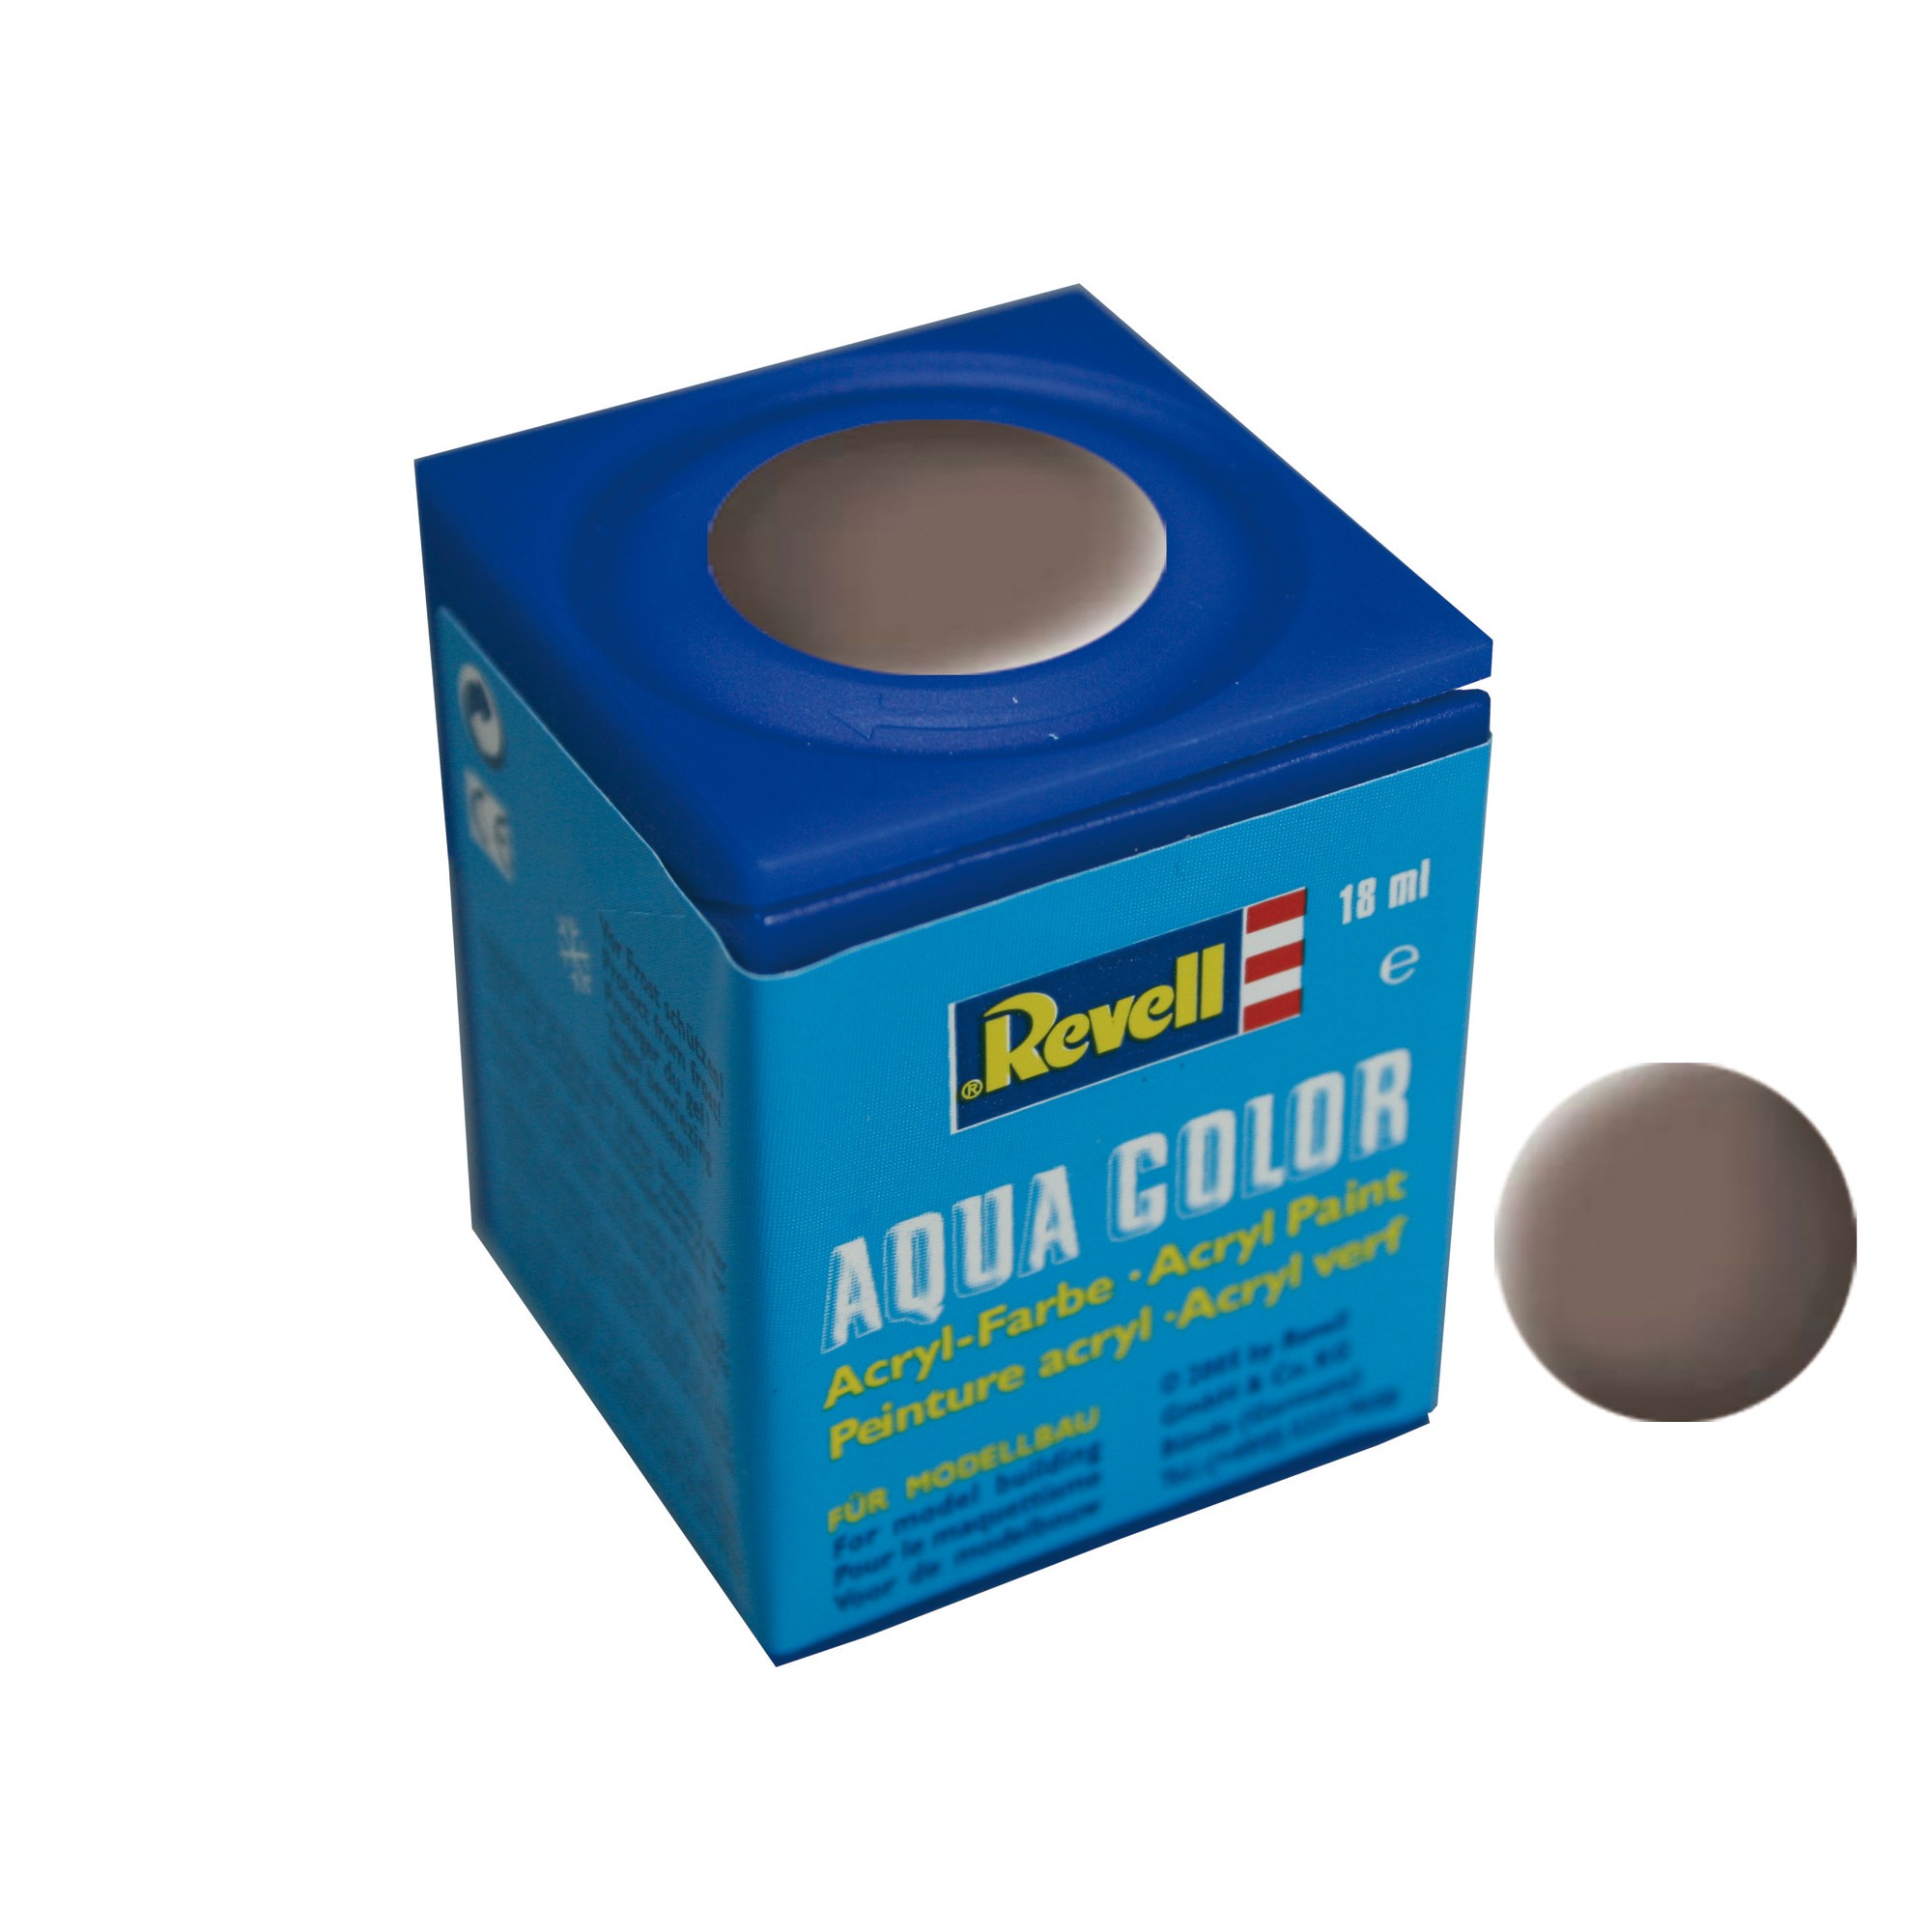 Revell Aqua Color matt erdfarbe